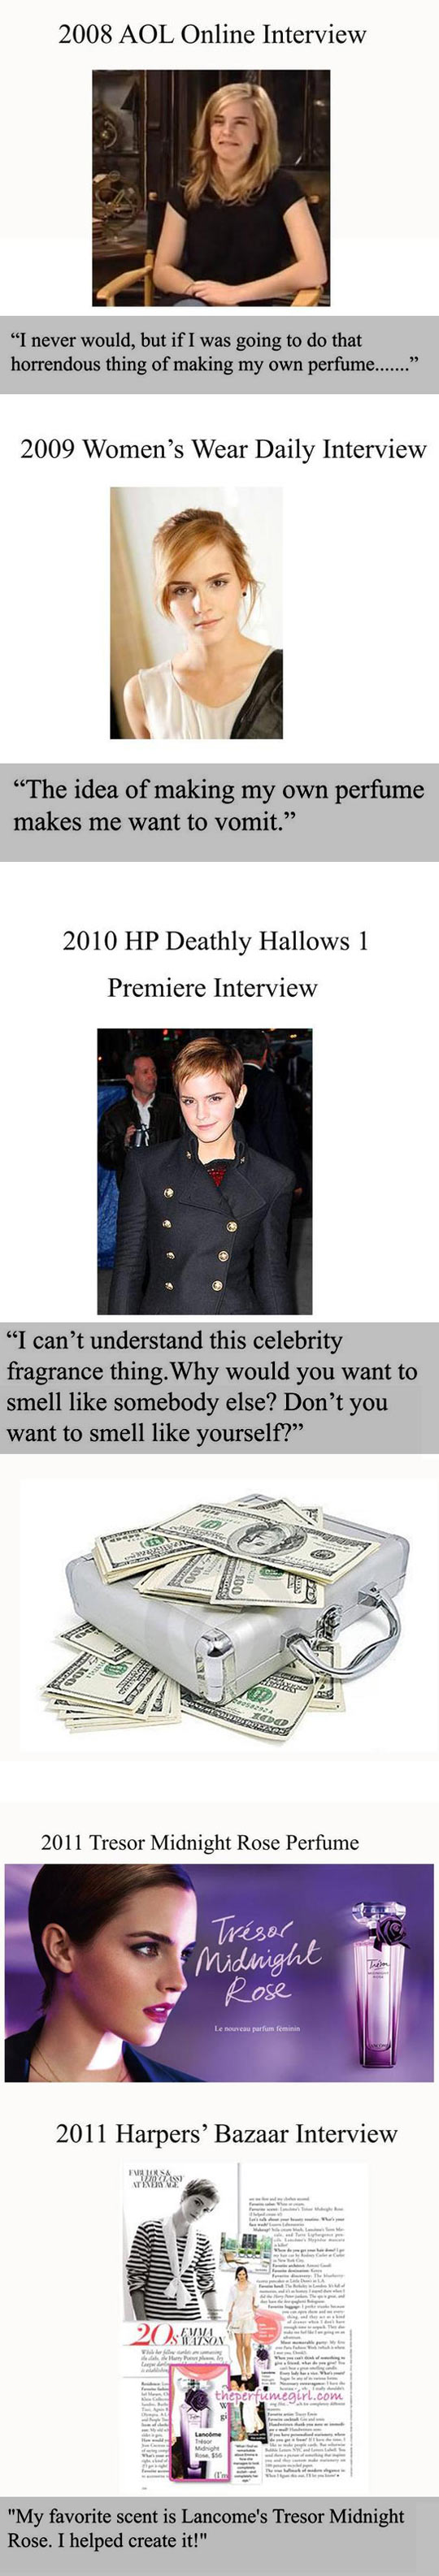 funny-Emma-Watson-own-perfume